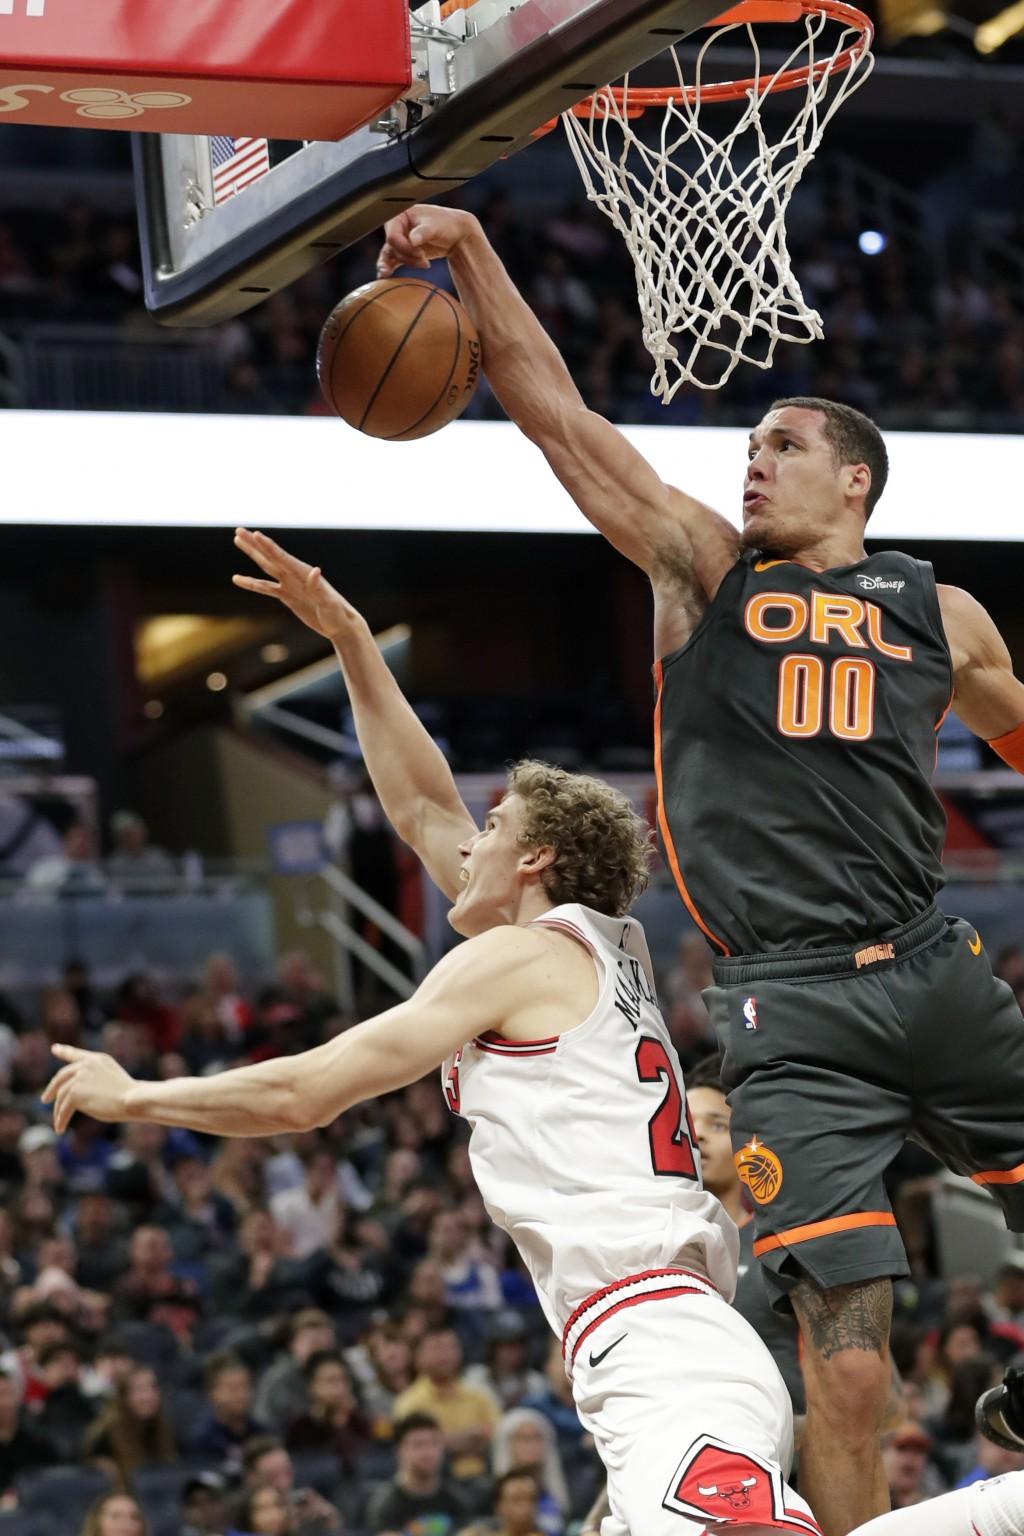 Orlando Magic forward Aaron Gordon (00) blocks a shot attempt by Chicago Bulls forward Lauri Markkanen, left, during the first half of an NBA basketba...